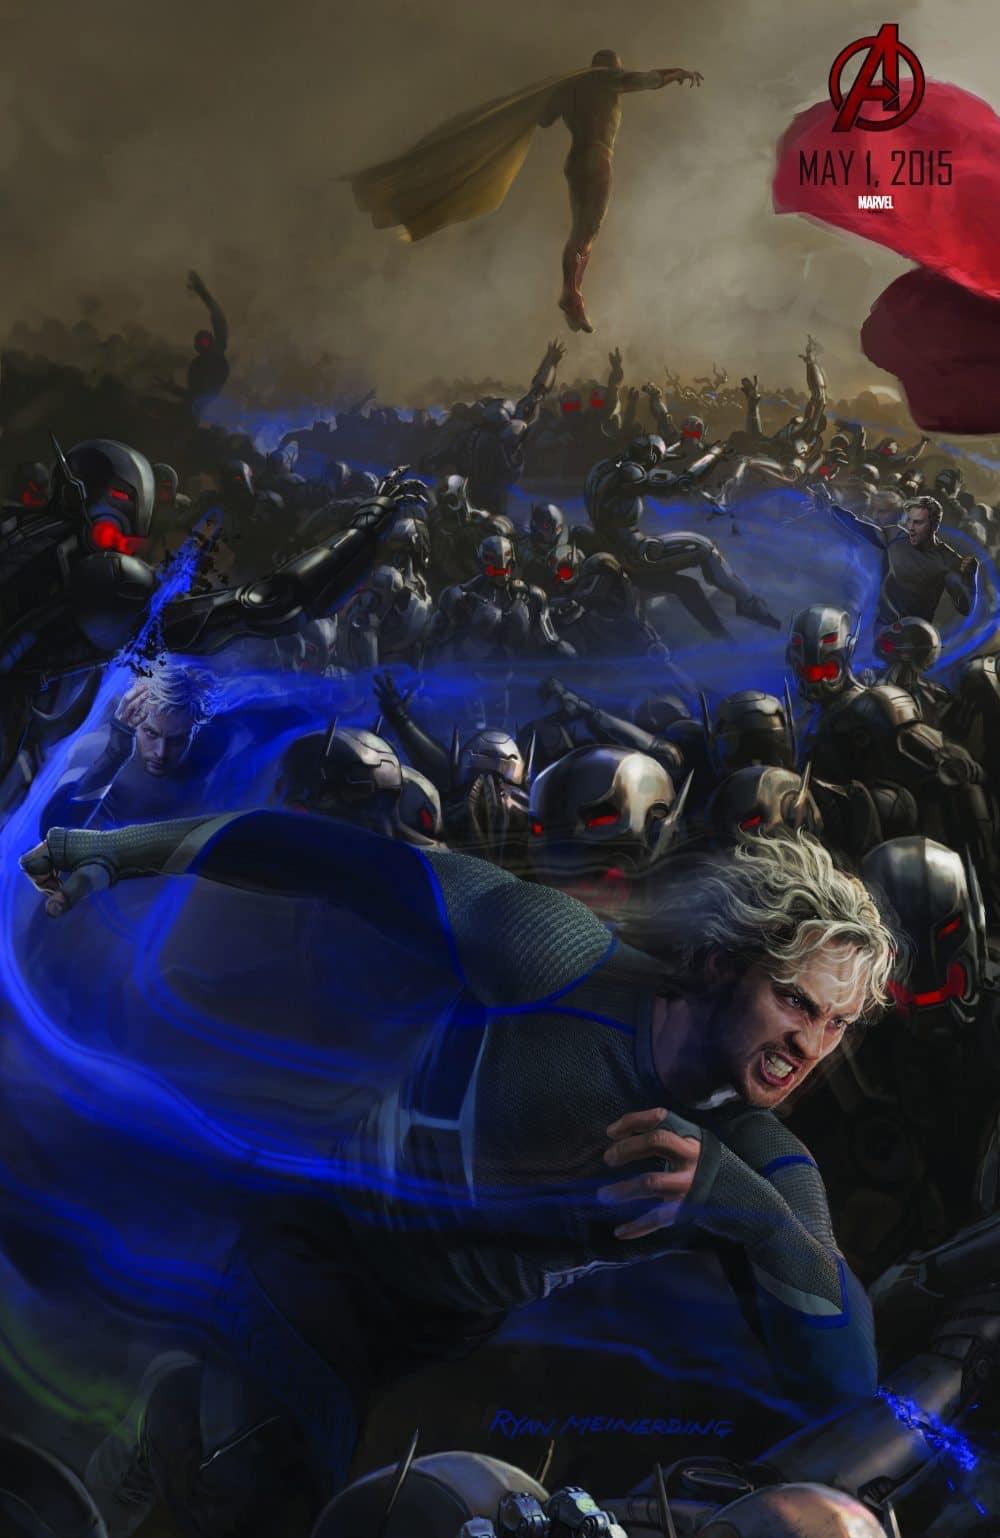 Quicksilver resucitará en Vengadores: Infinity War (2018)